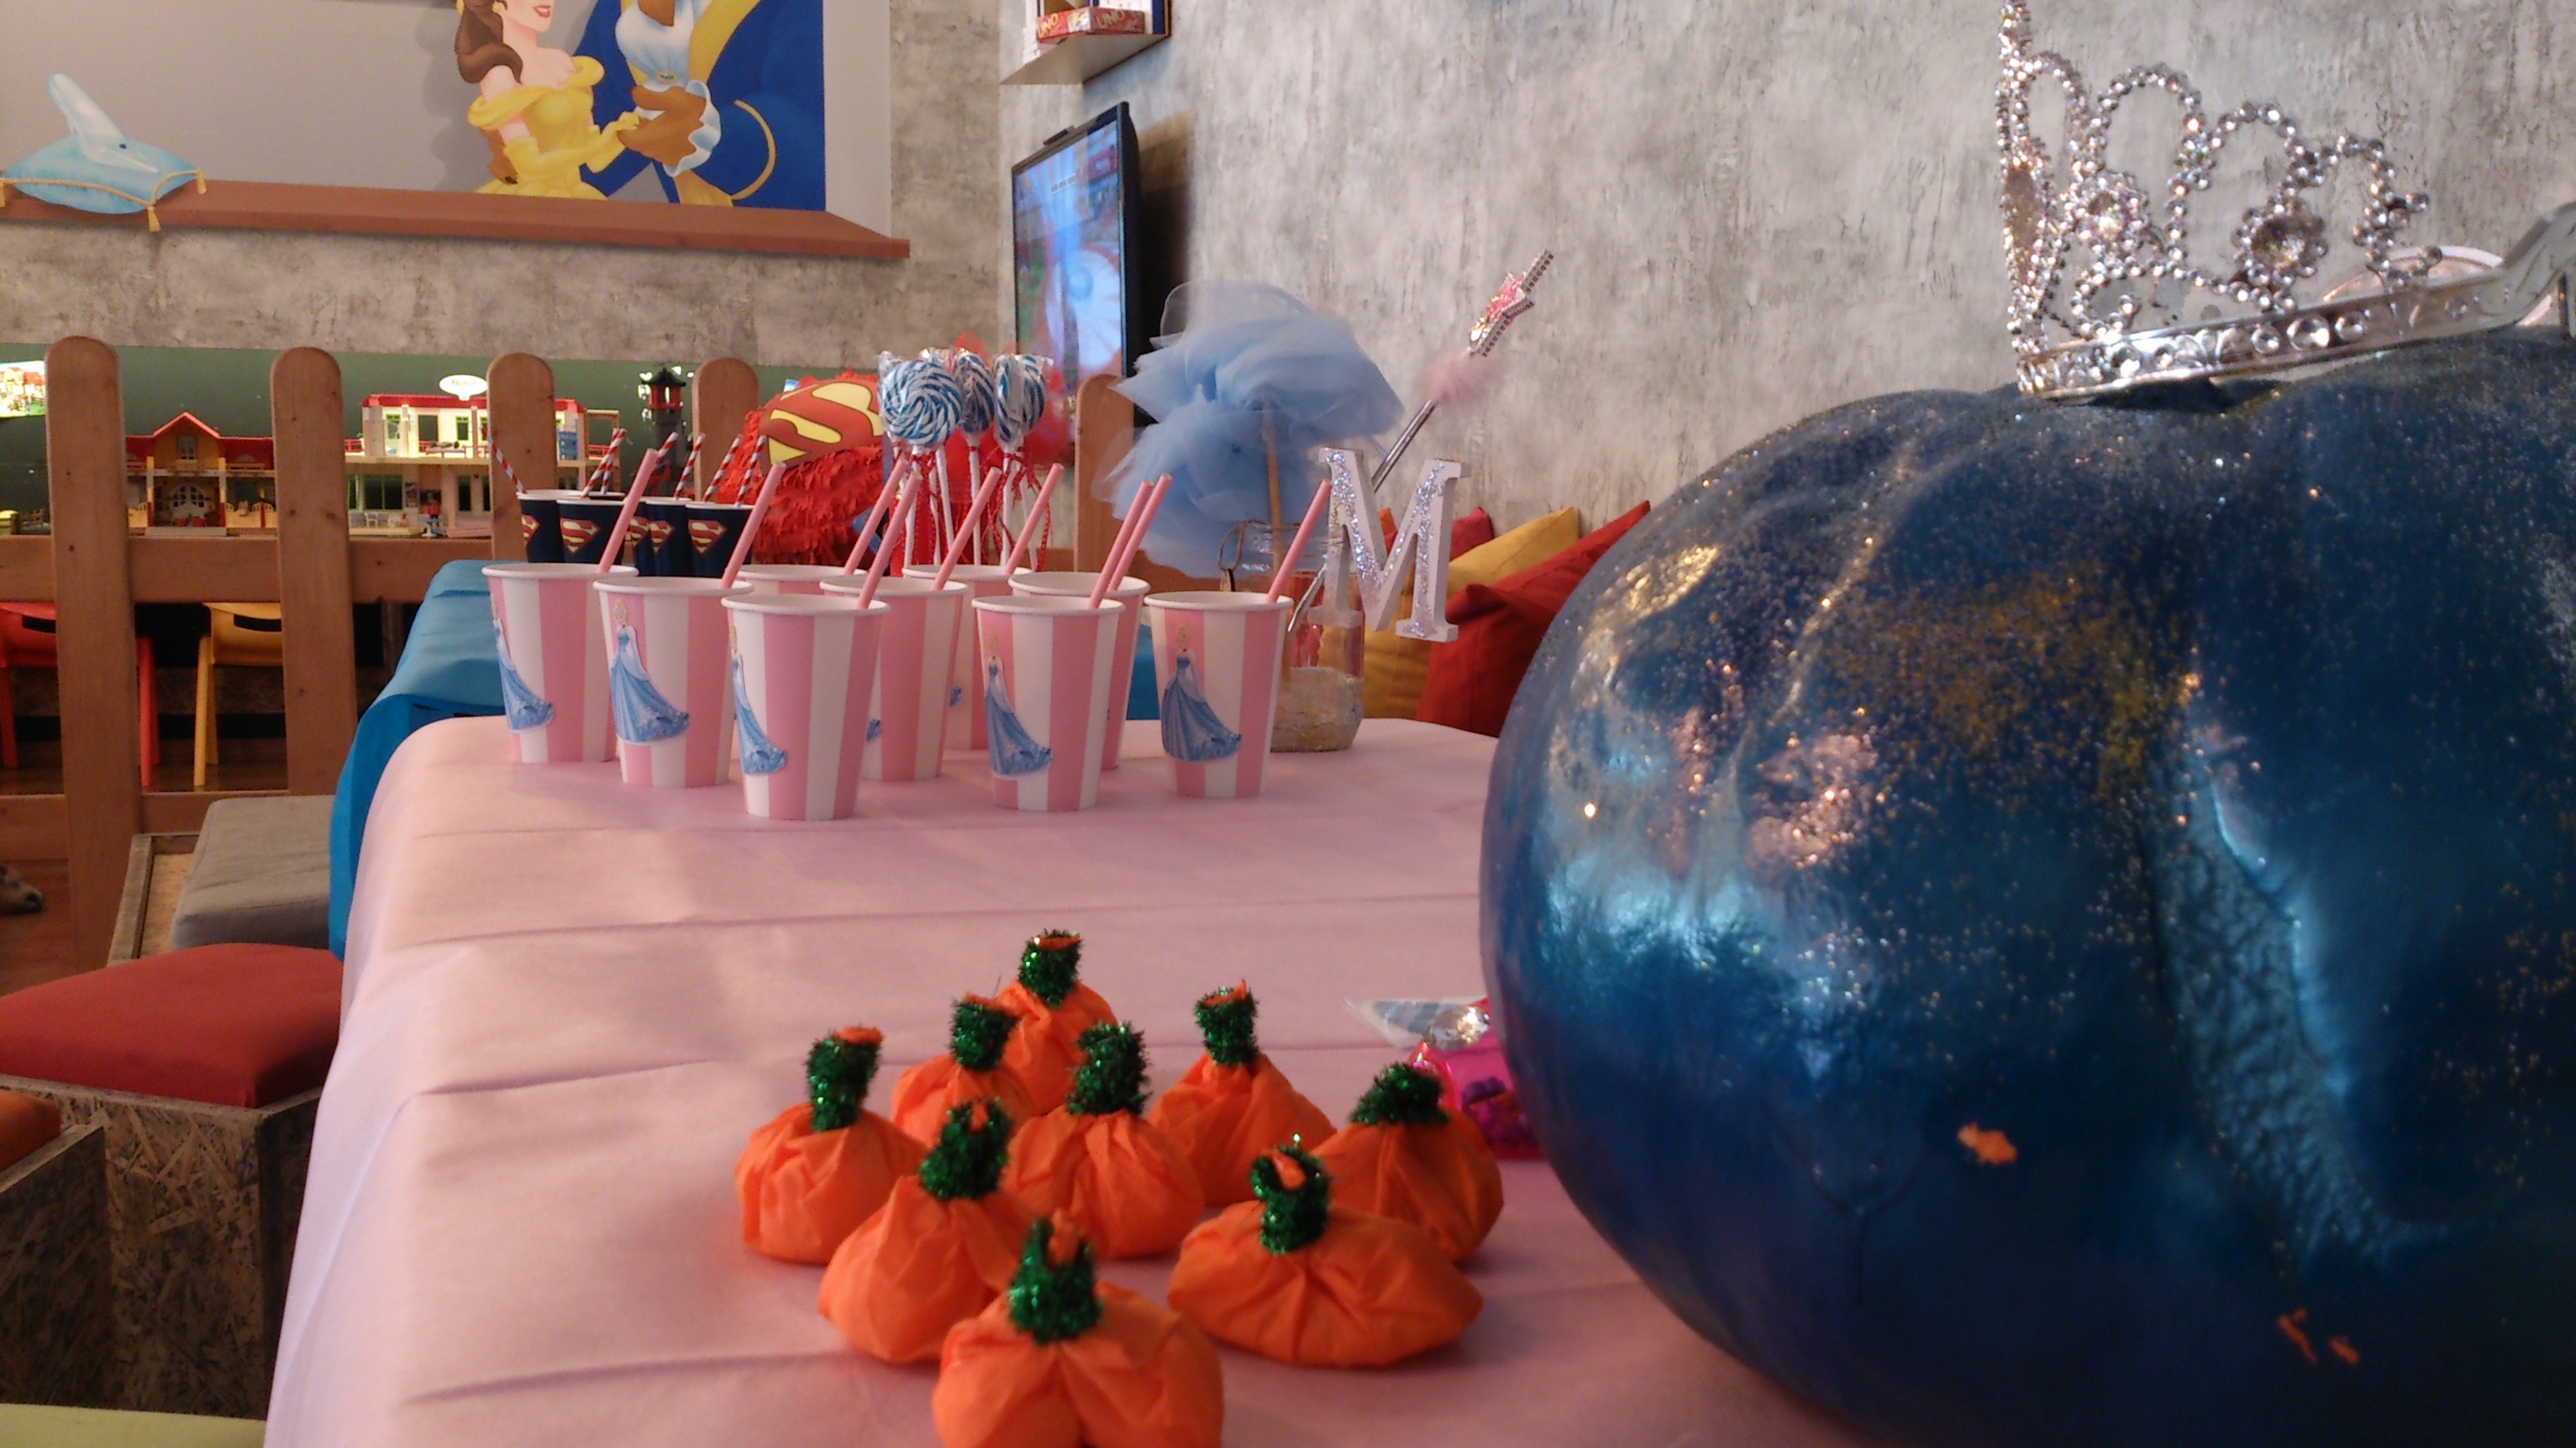 Fairytale Κορυτσάς 3 Γλυκά Νερά Παιδότοπος Παιδικά Πάρτυ